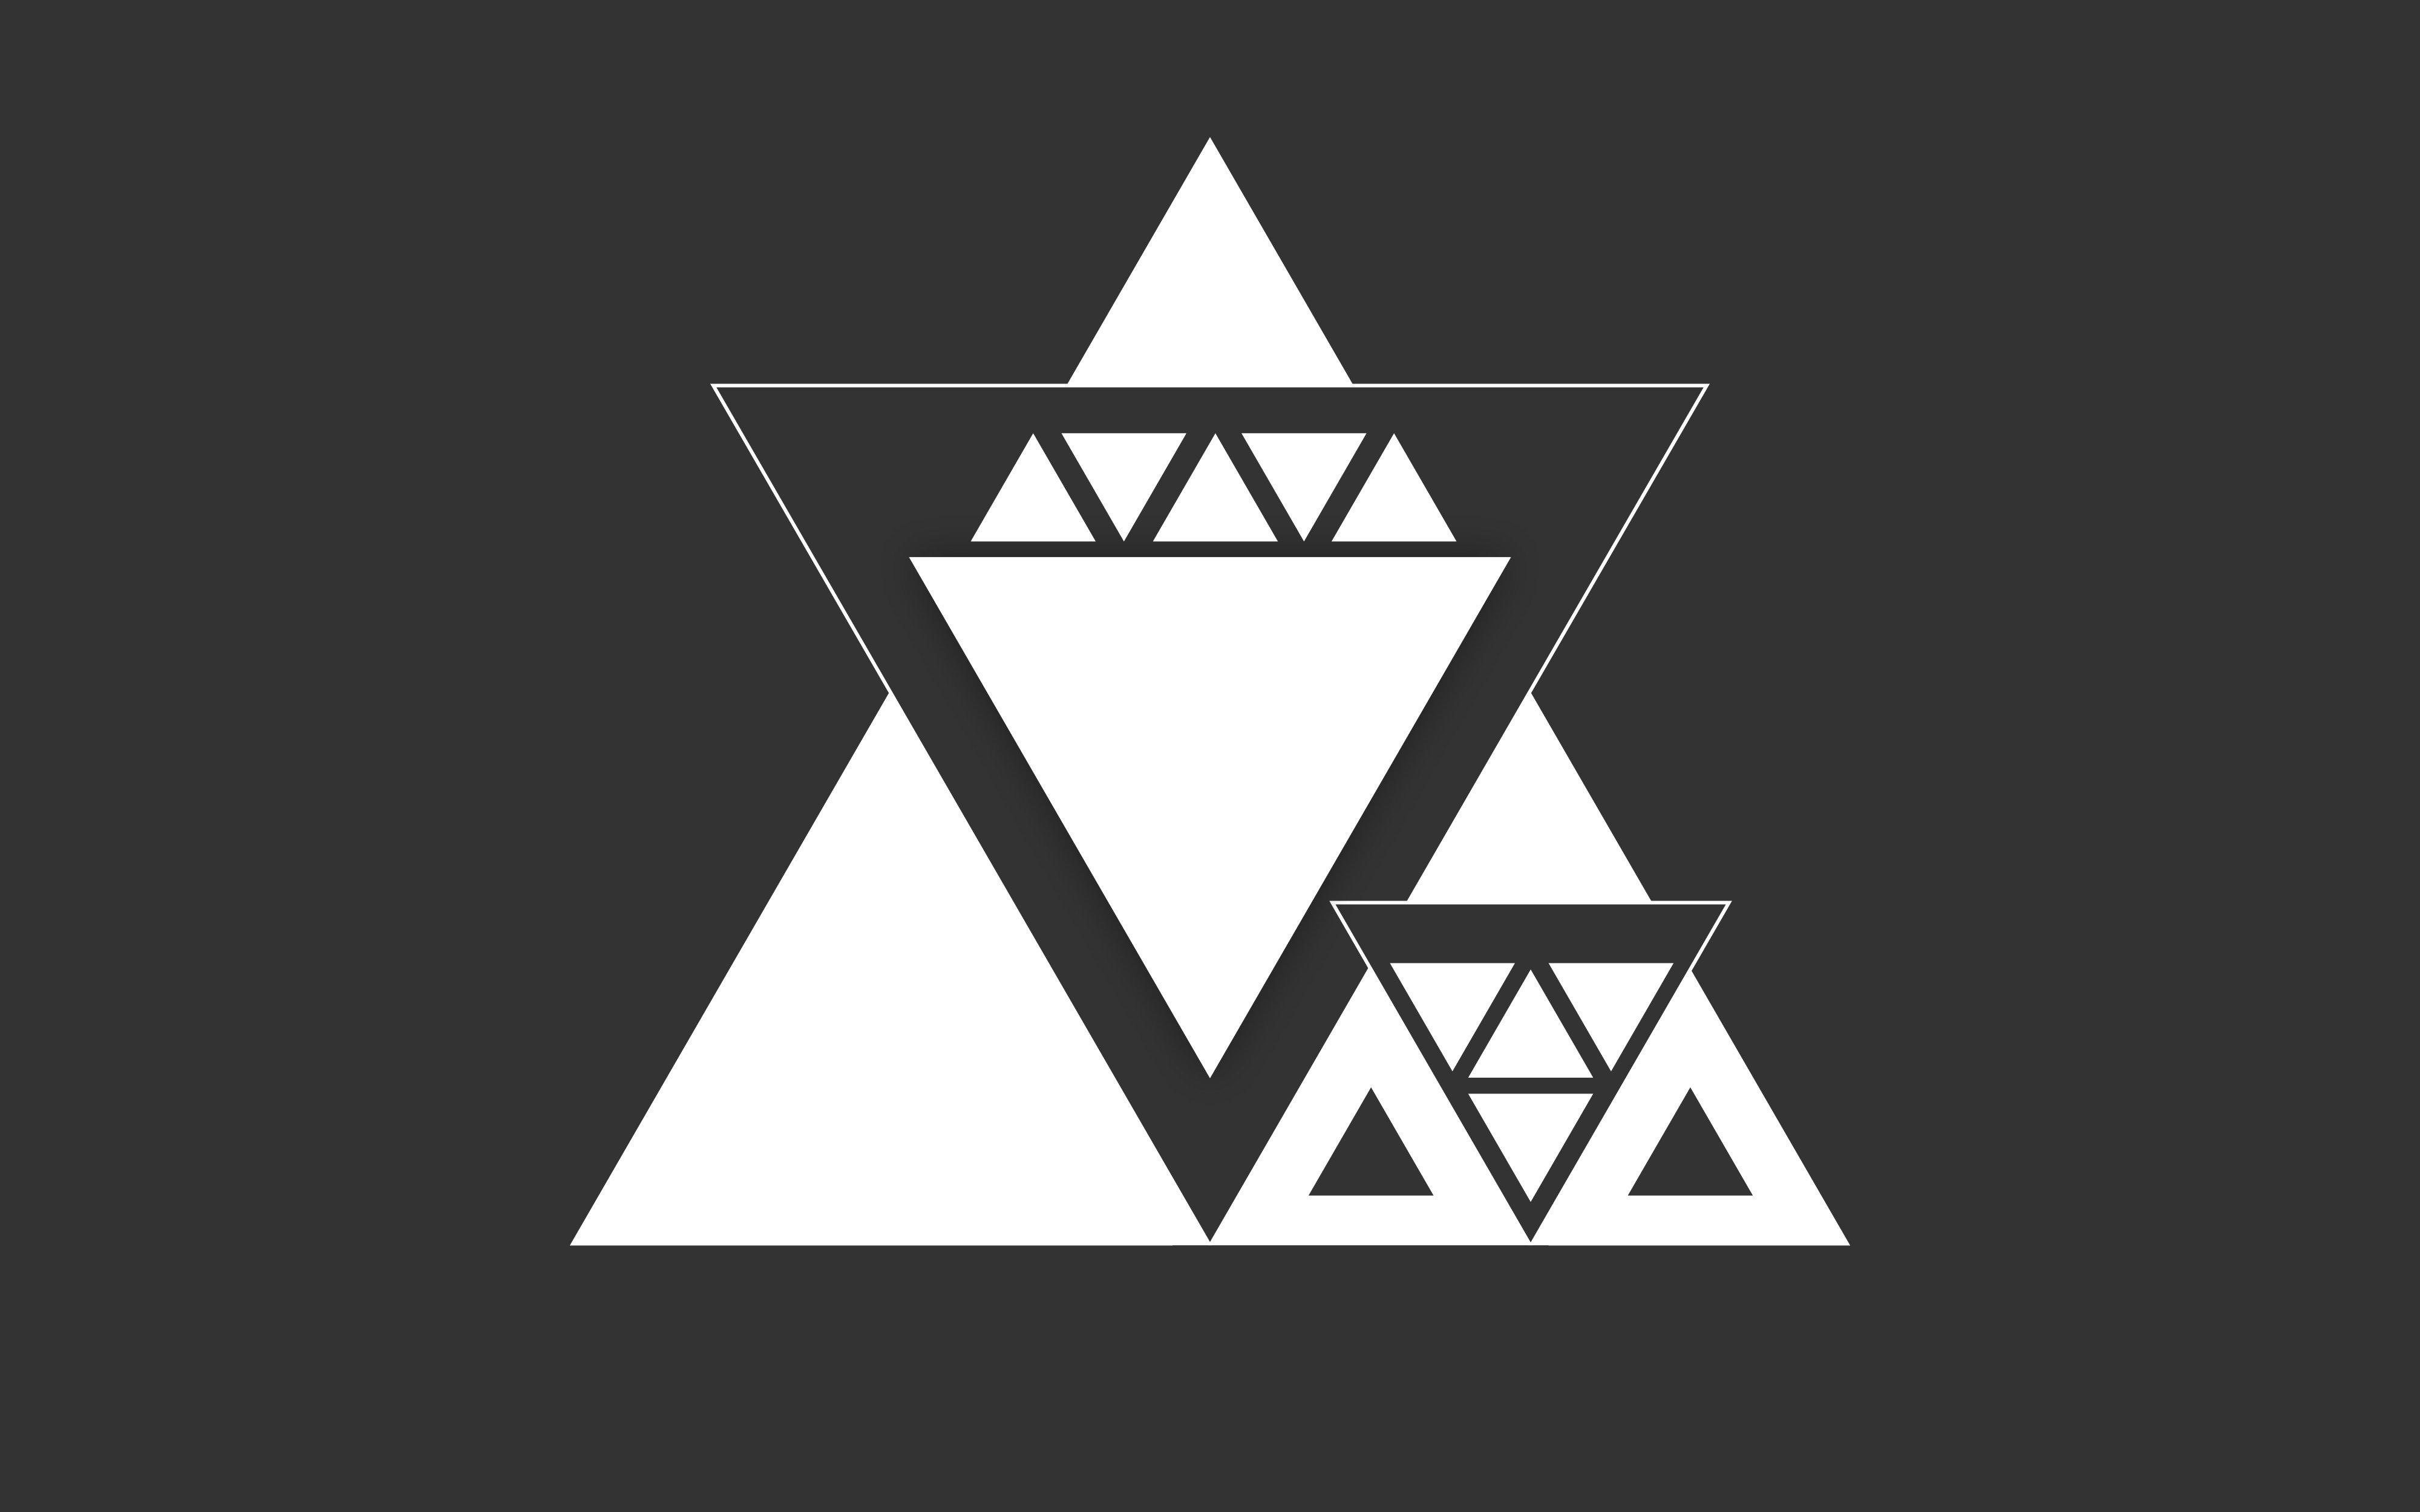 Triangle vector monochrome minimalism graphic design for Minimal art vector